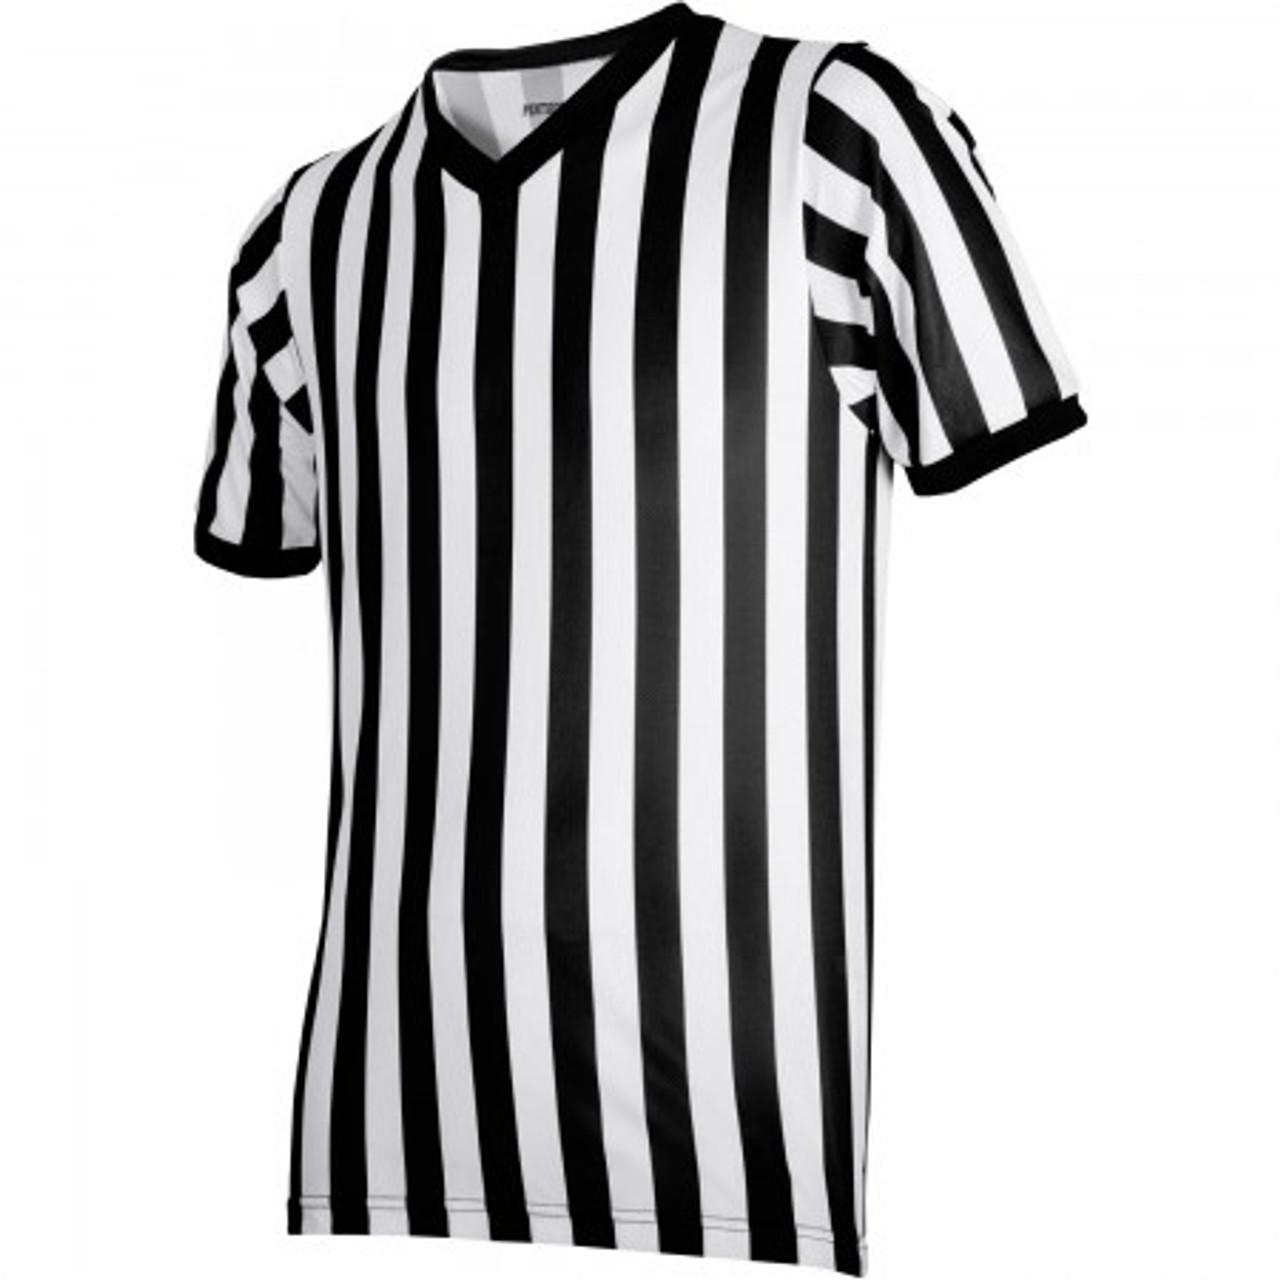 Honig's ProSoft Basketball Referee Shirt Extra Tall